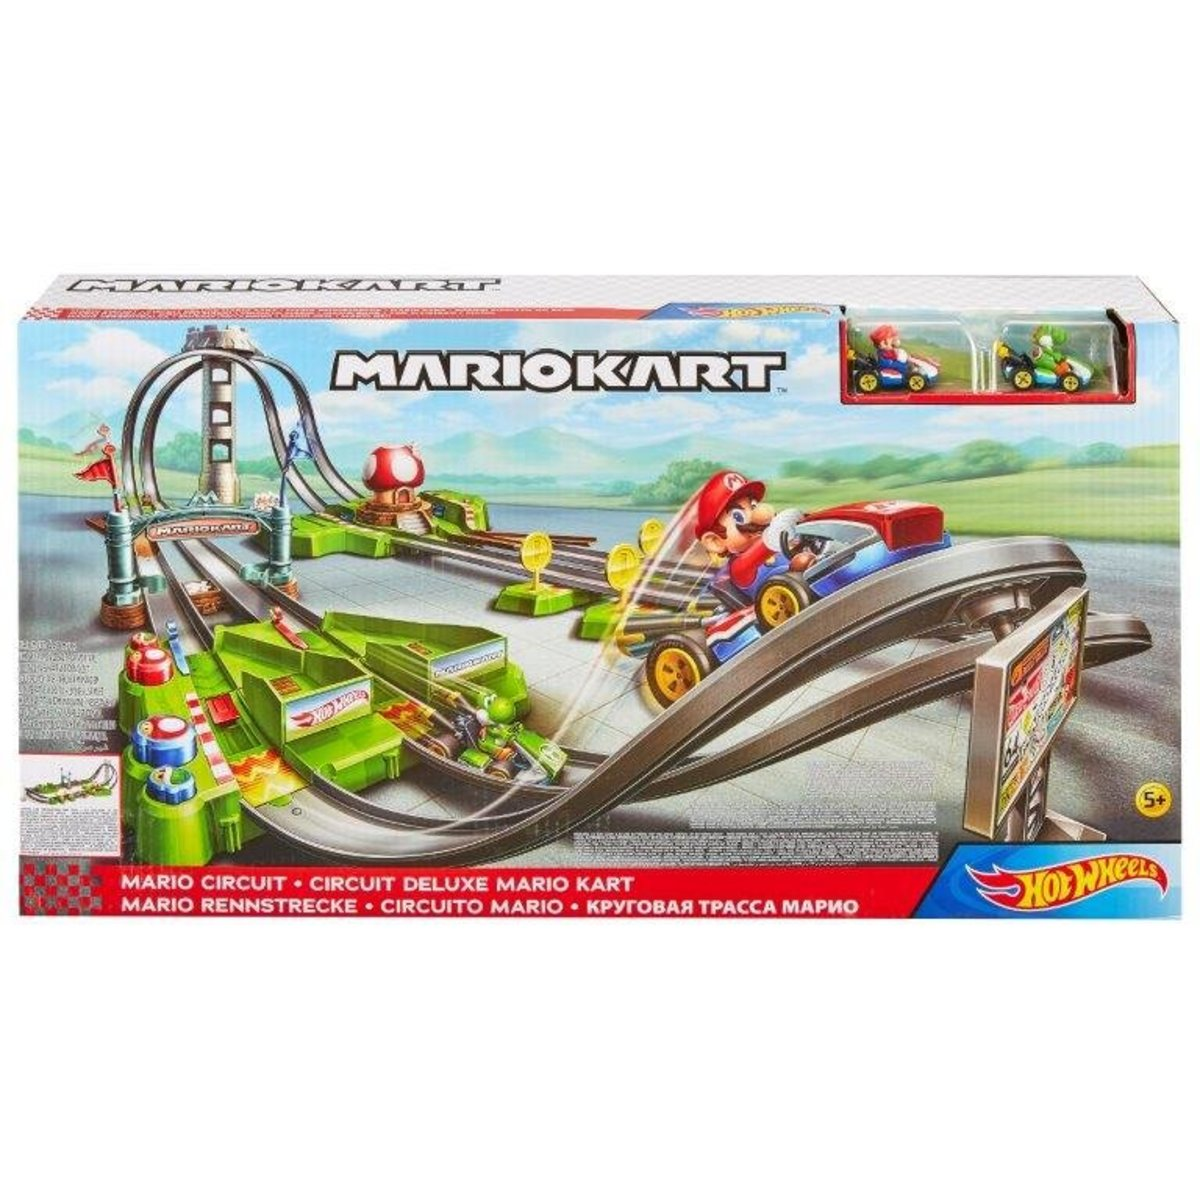 Hot Wheels Mario Kart Circuit TS